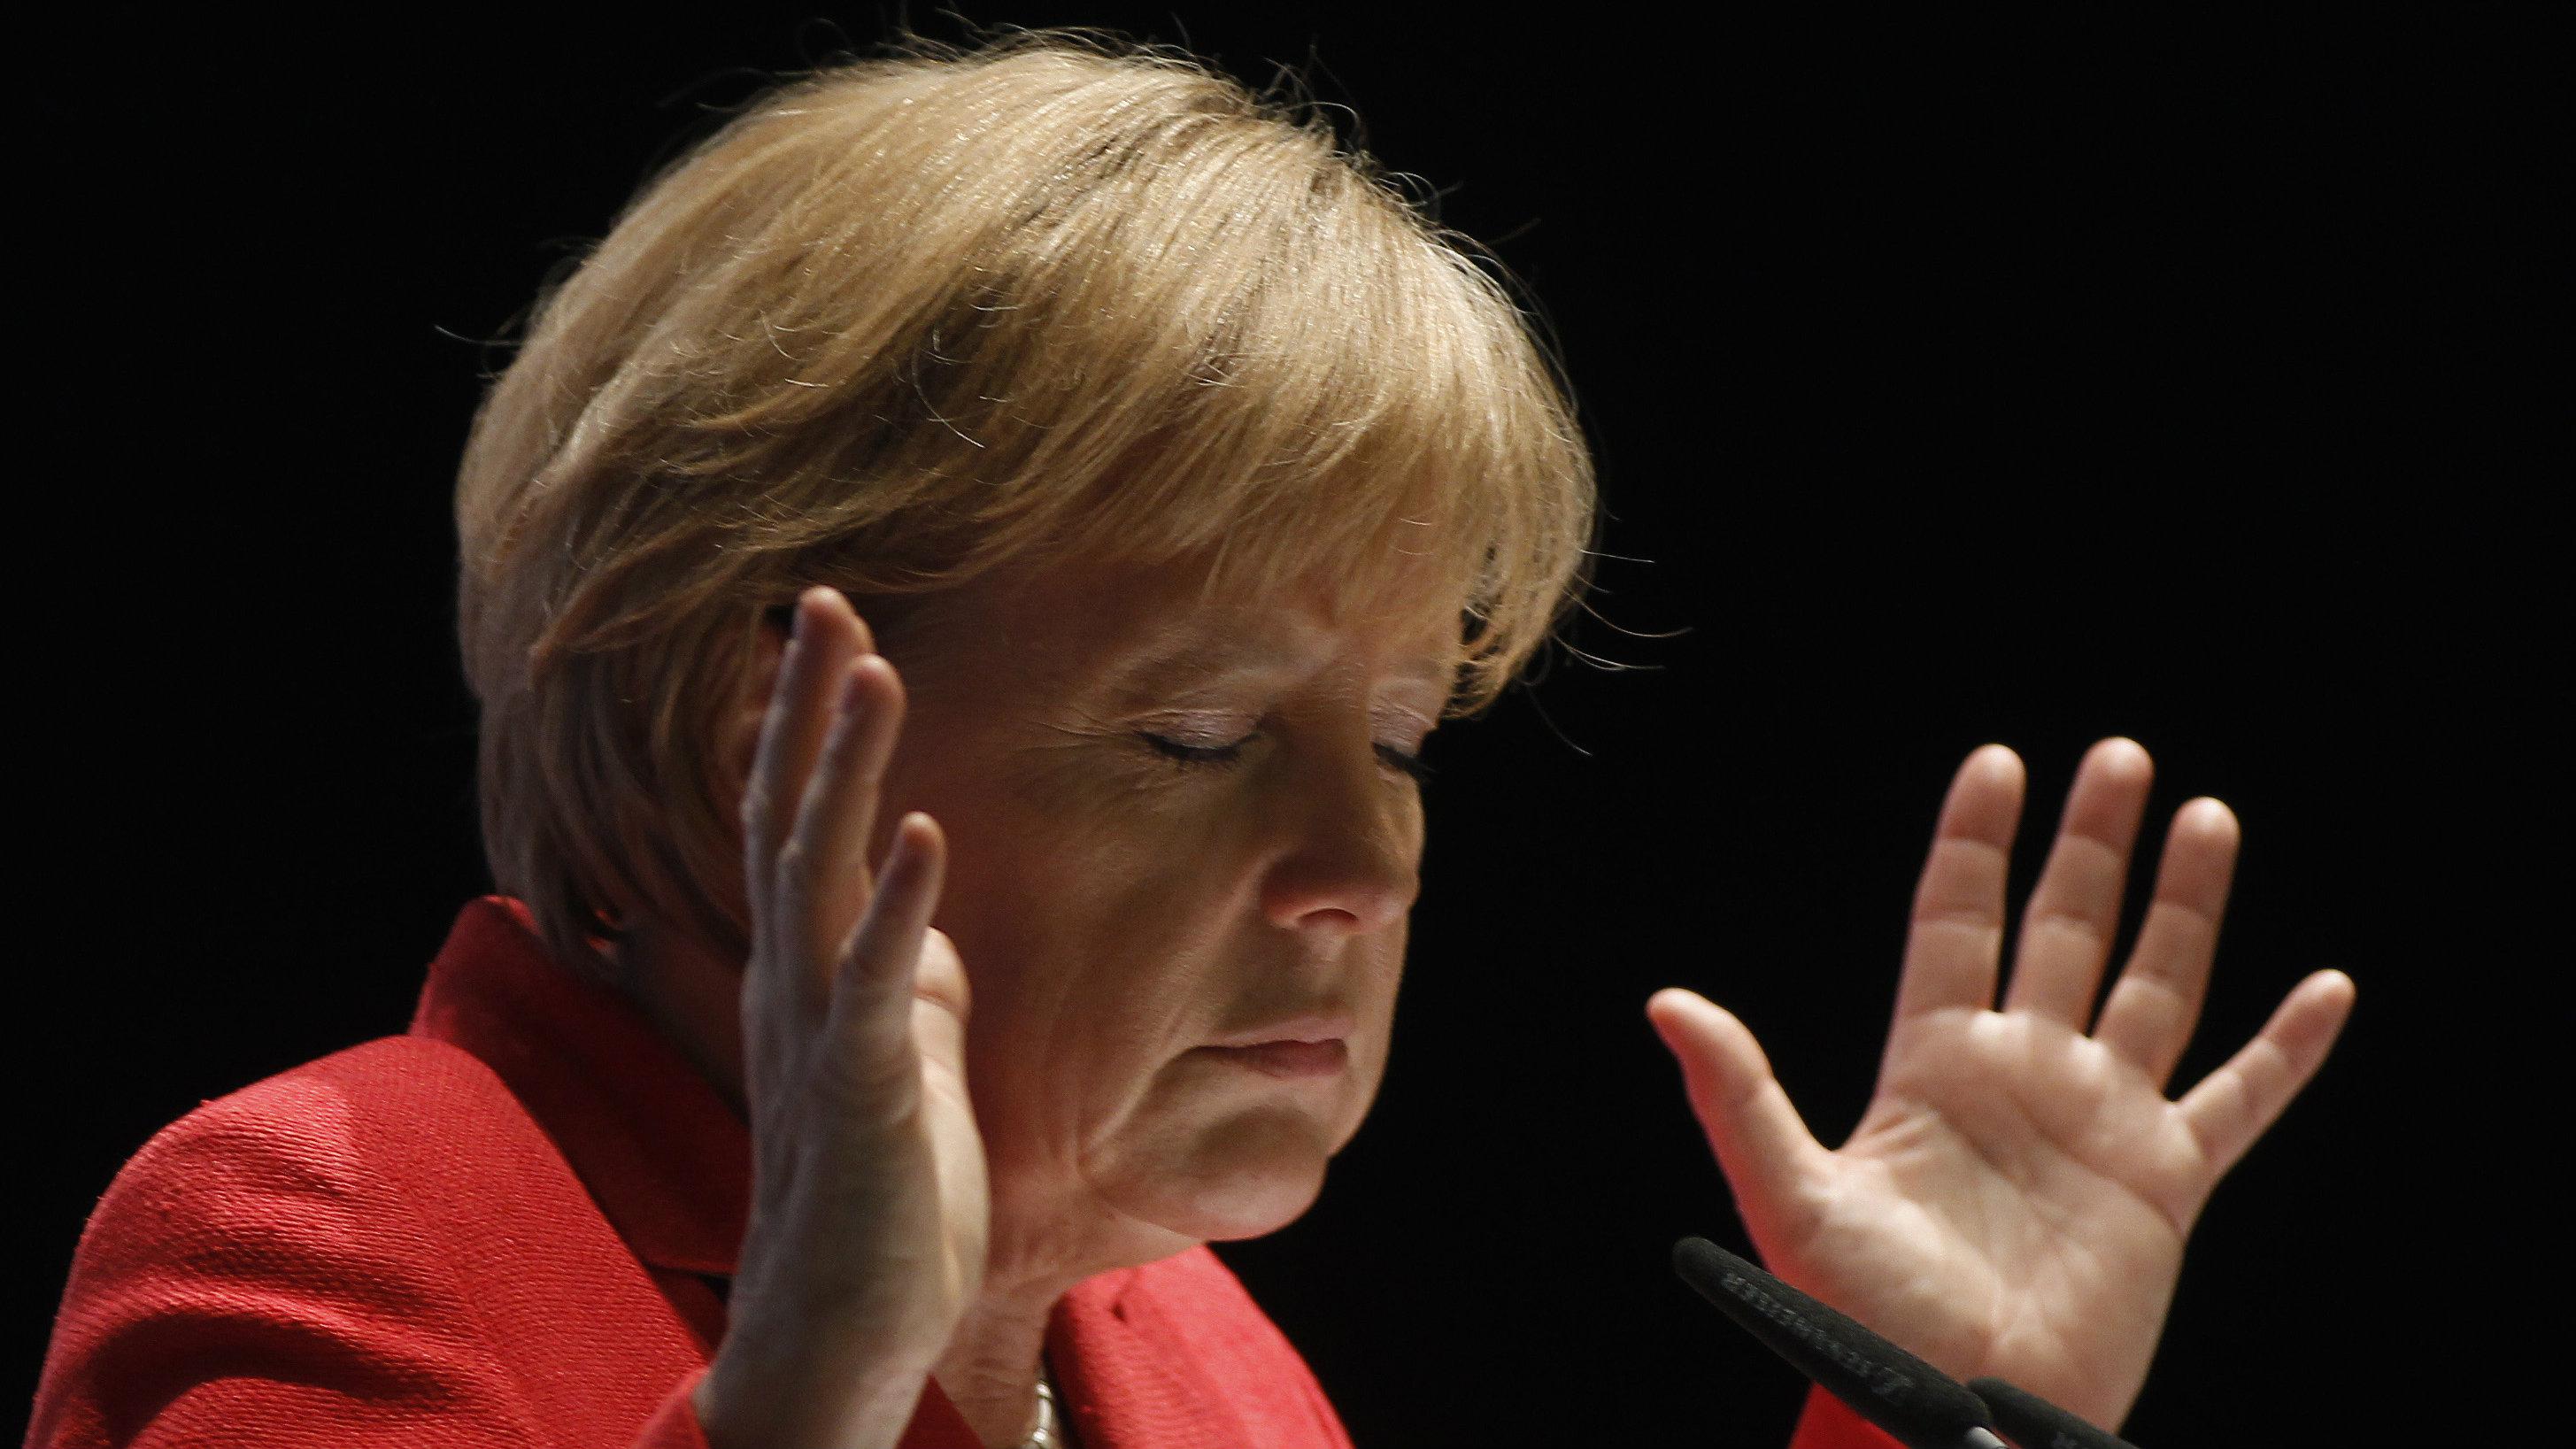 Angela Merkel closes her eyes and raises her hands